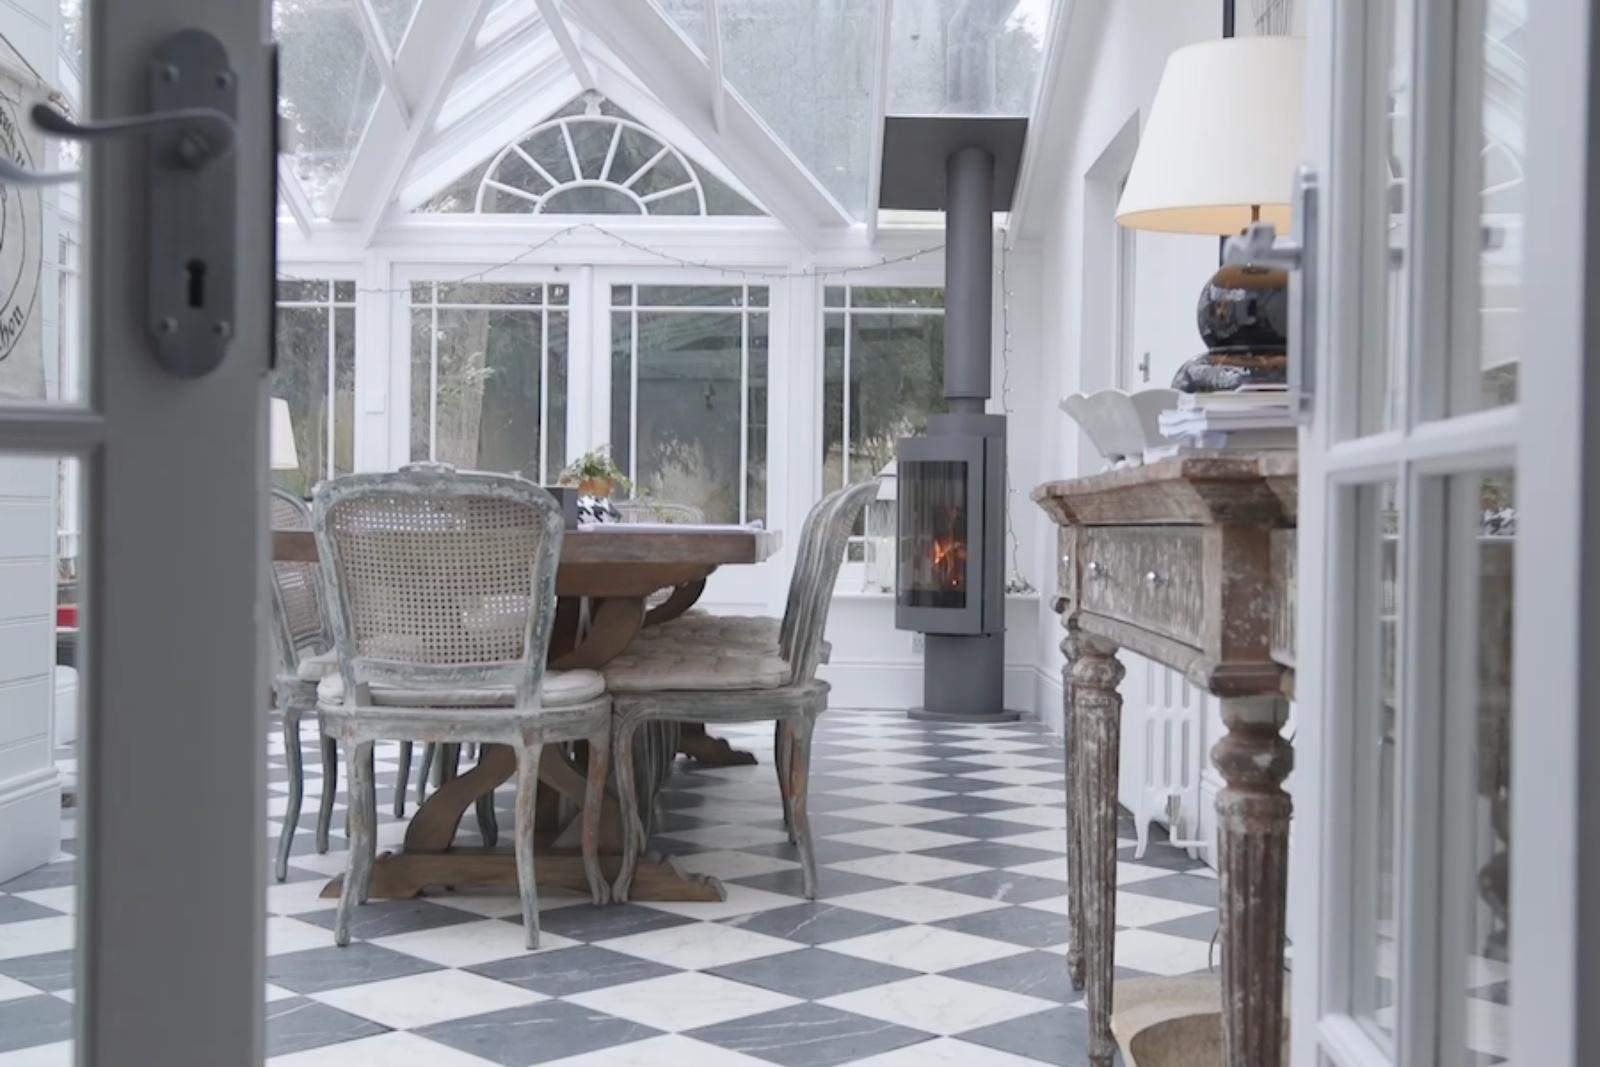 The conservatory dining room with Harrie Leenders slim Cylon log burner.